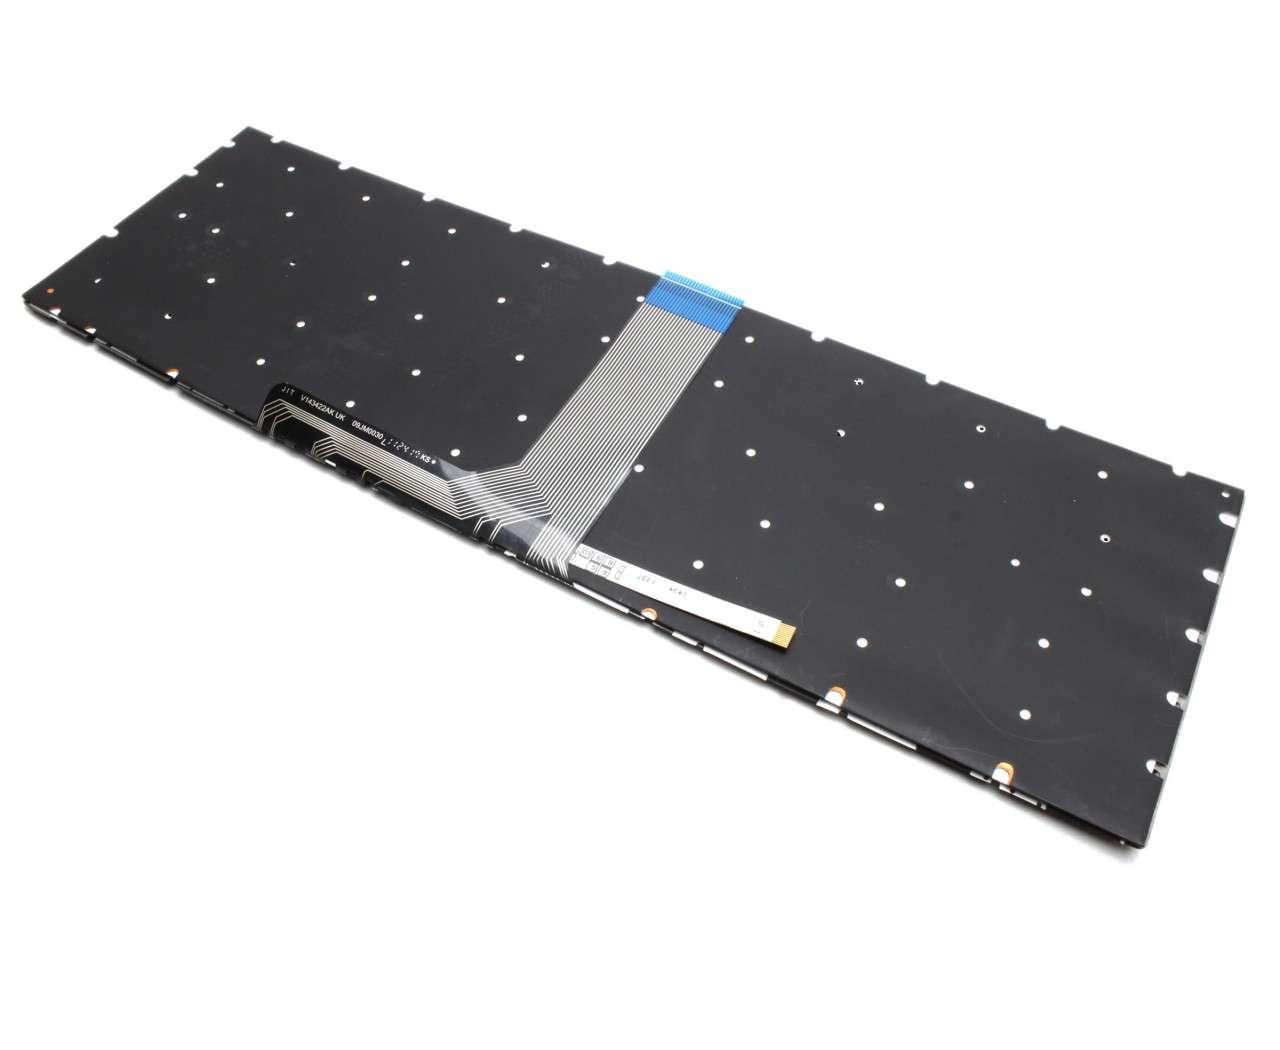 Tastatura MSI GP63 Leopard 8R iluminata backlit imagine powerlaptop.ro 2021